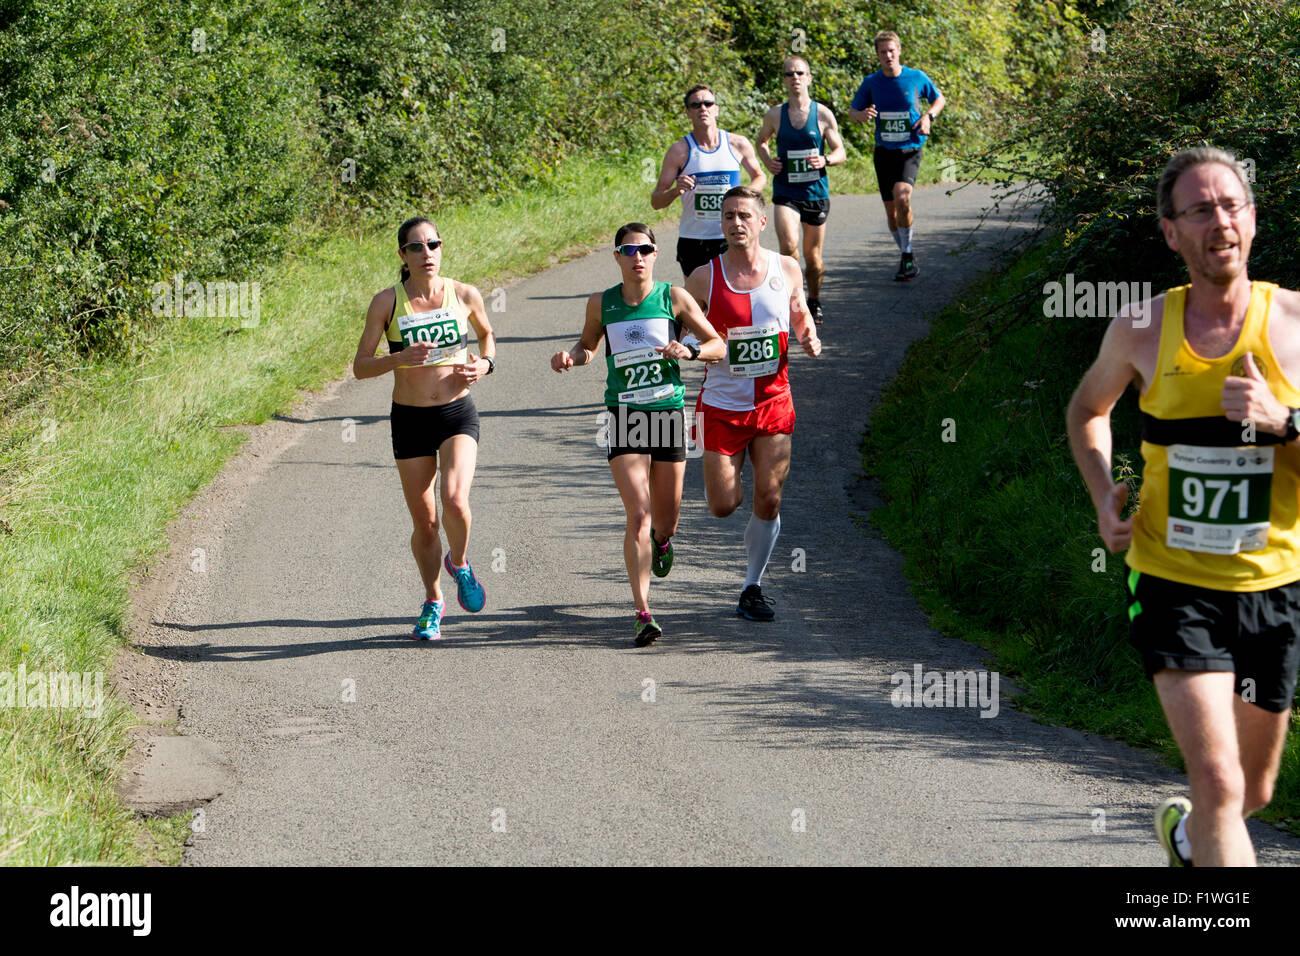 Half marathon runners on a country road, Warwickshire, UK - Stock Image